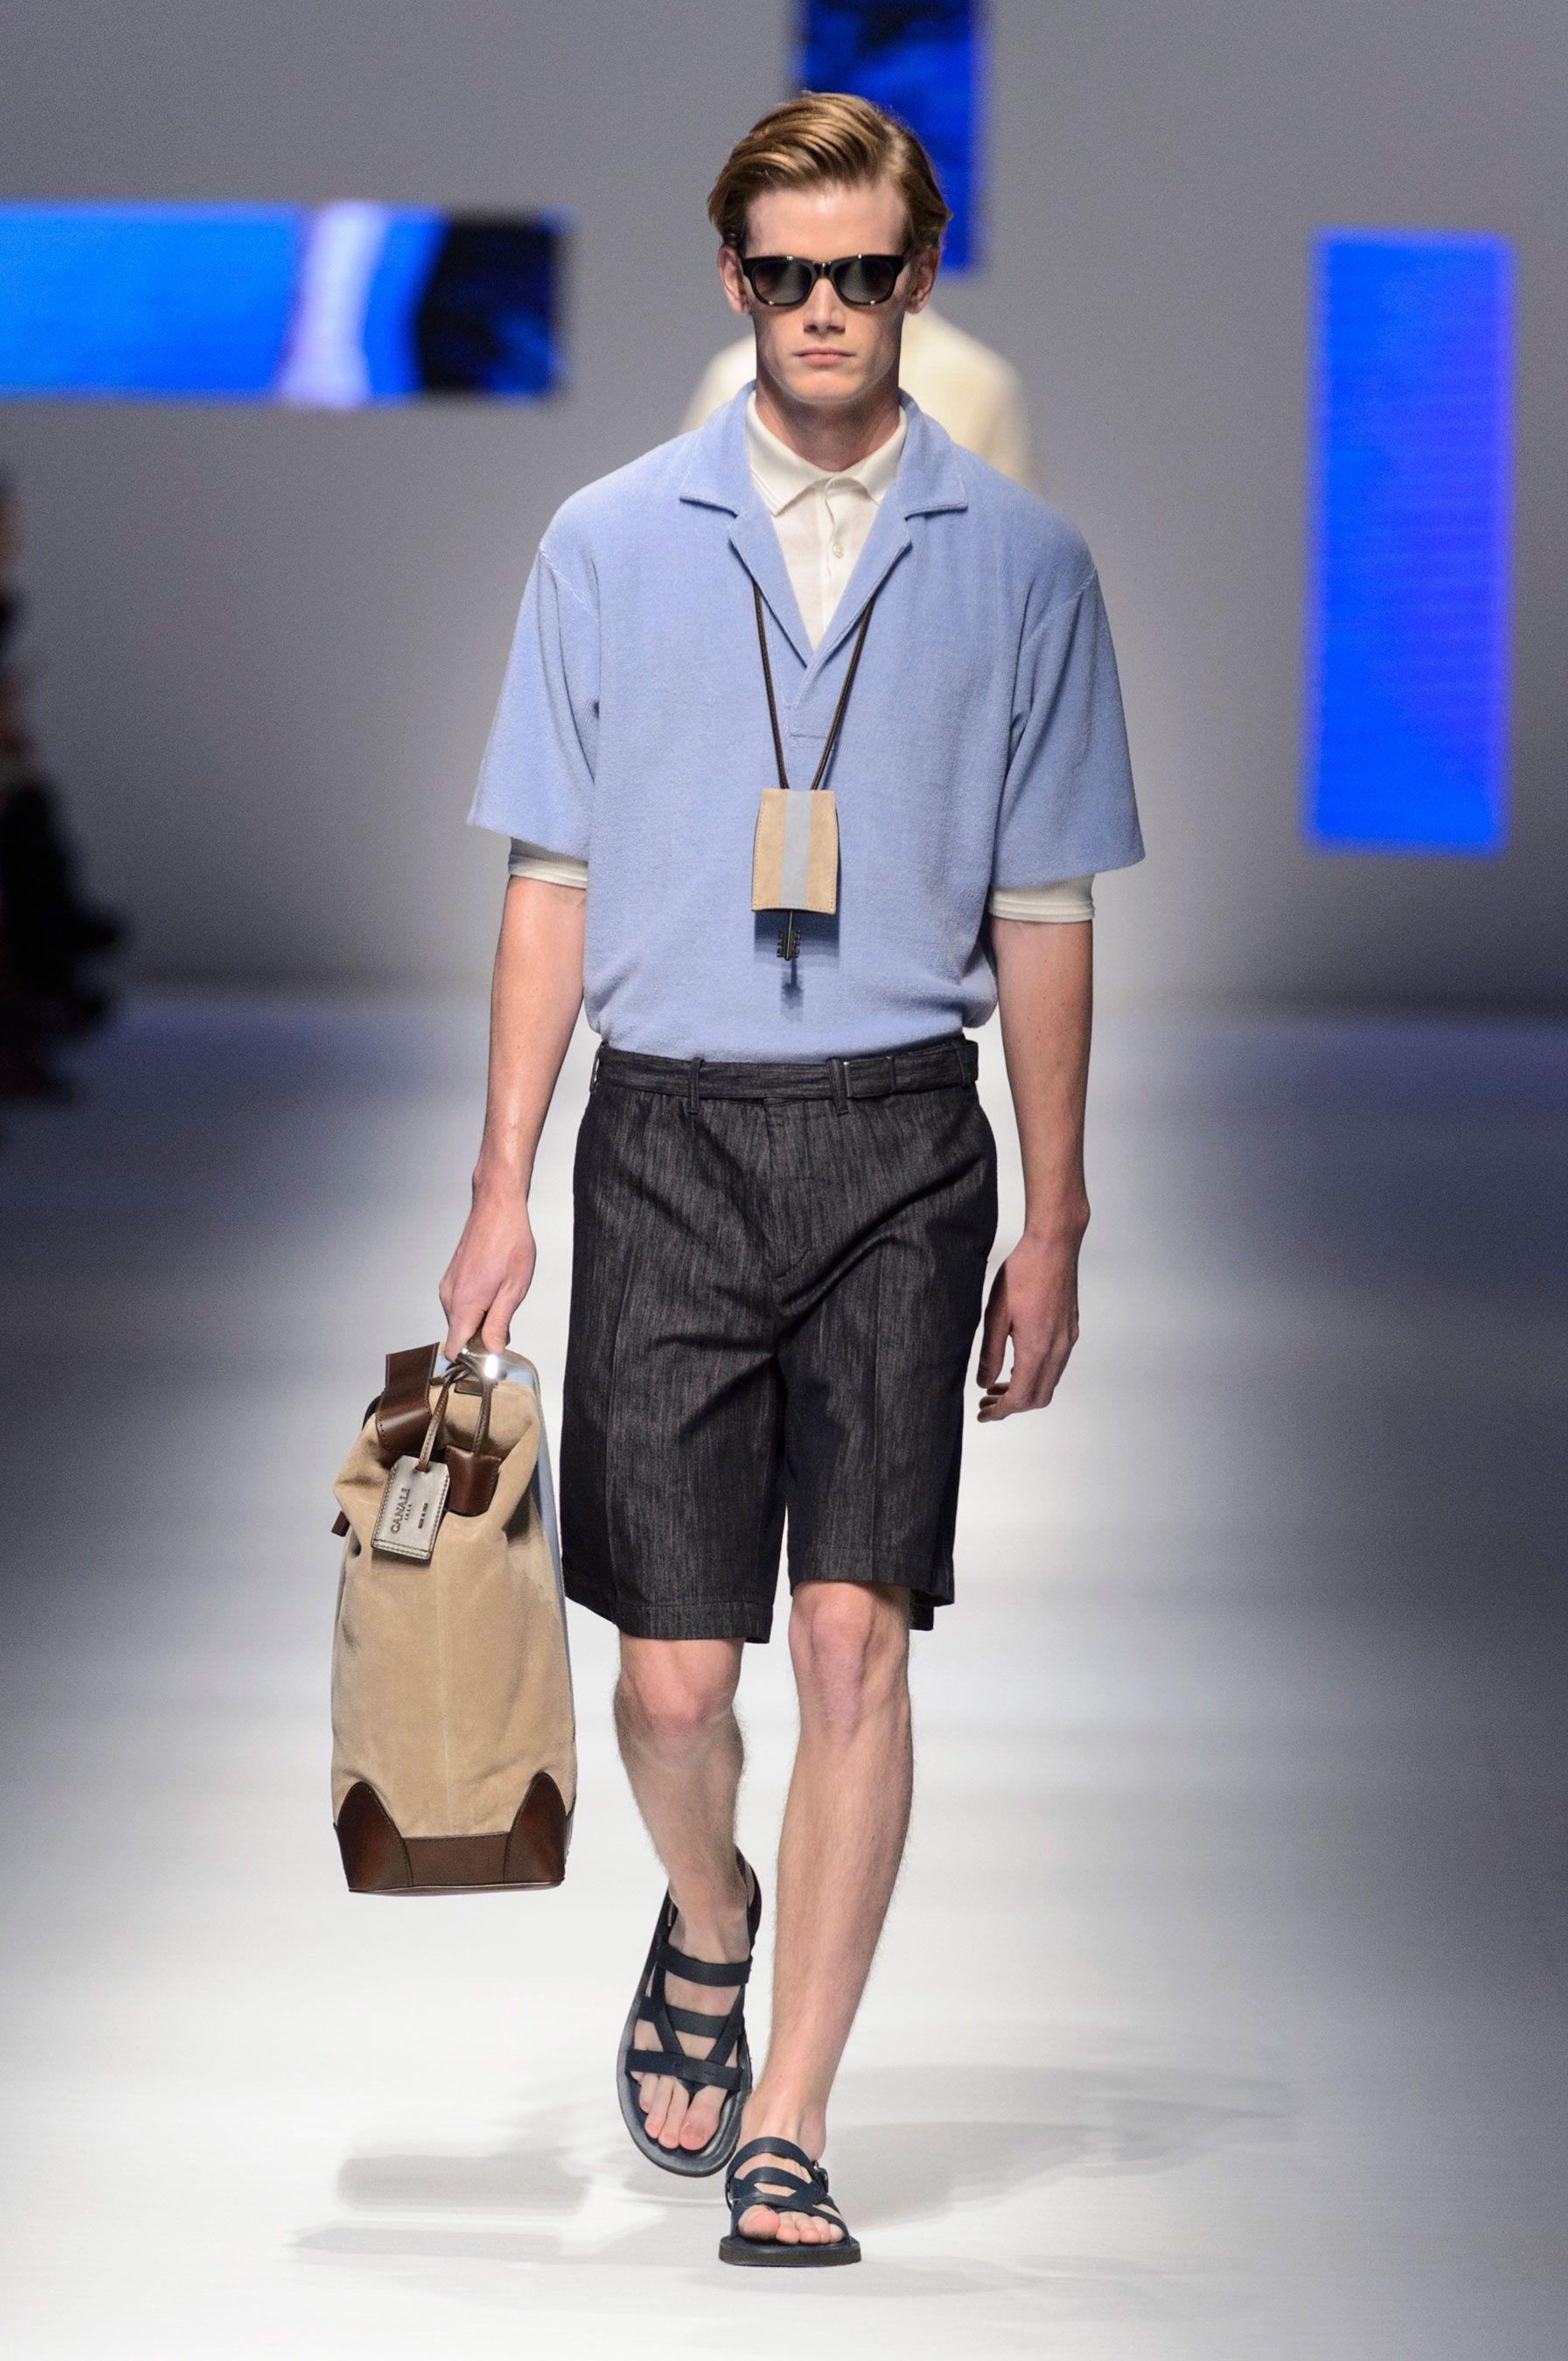 Canali Spring Summer 2016 Primavera Verano #Menswear #Trends #Tendencias #Moda Hombre - Milan Fashion Week - D.P.